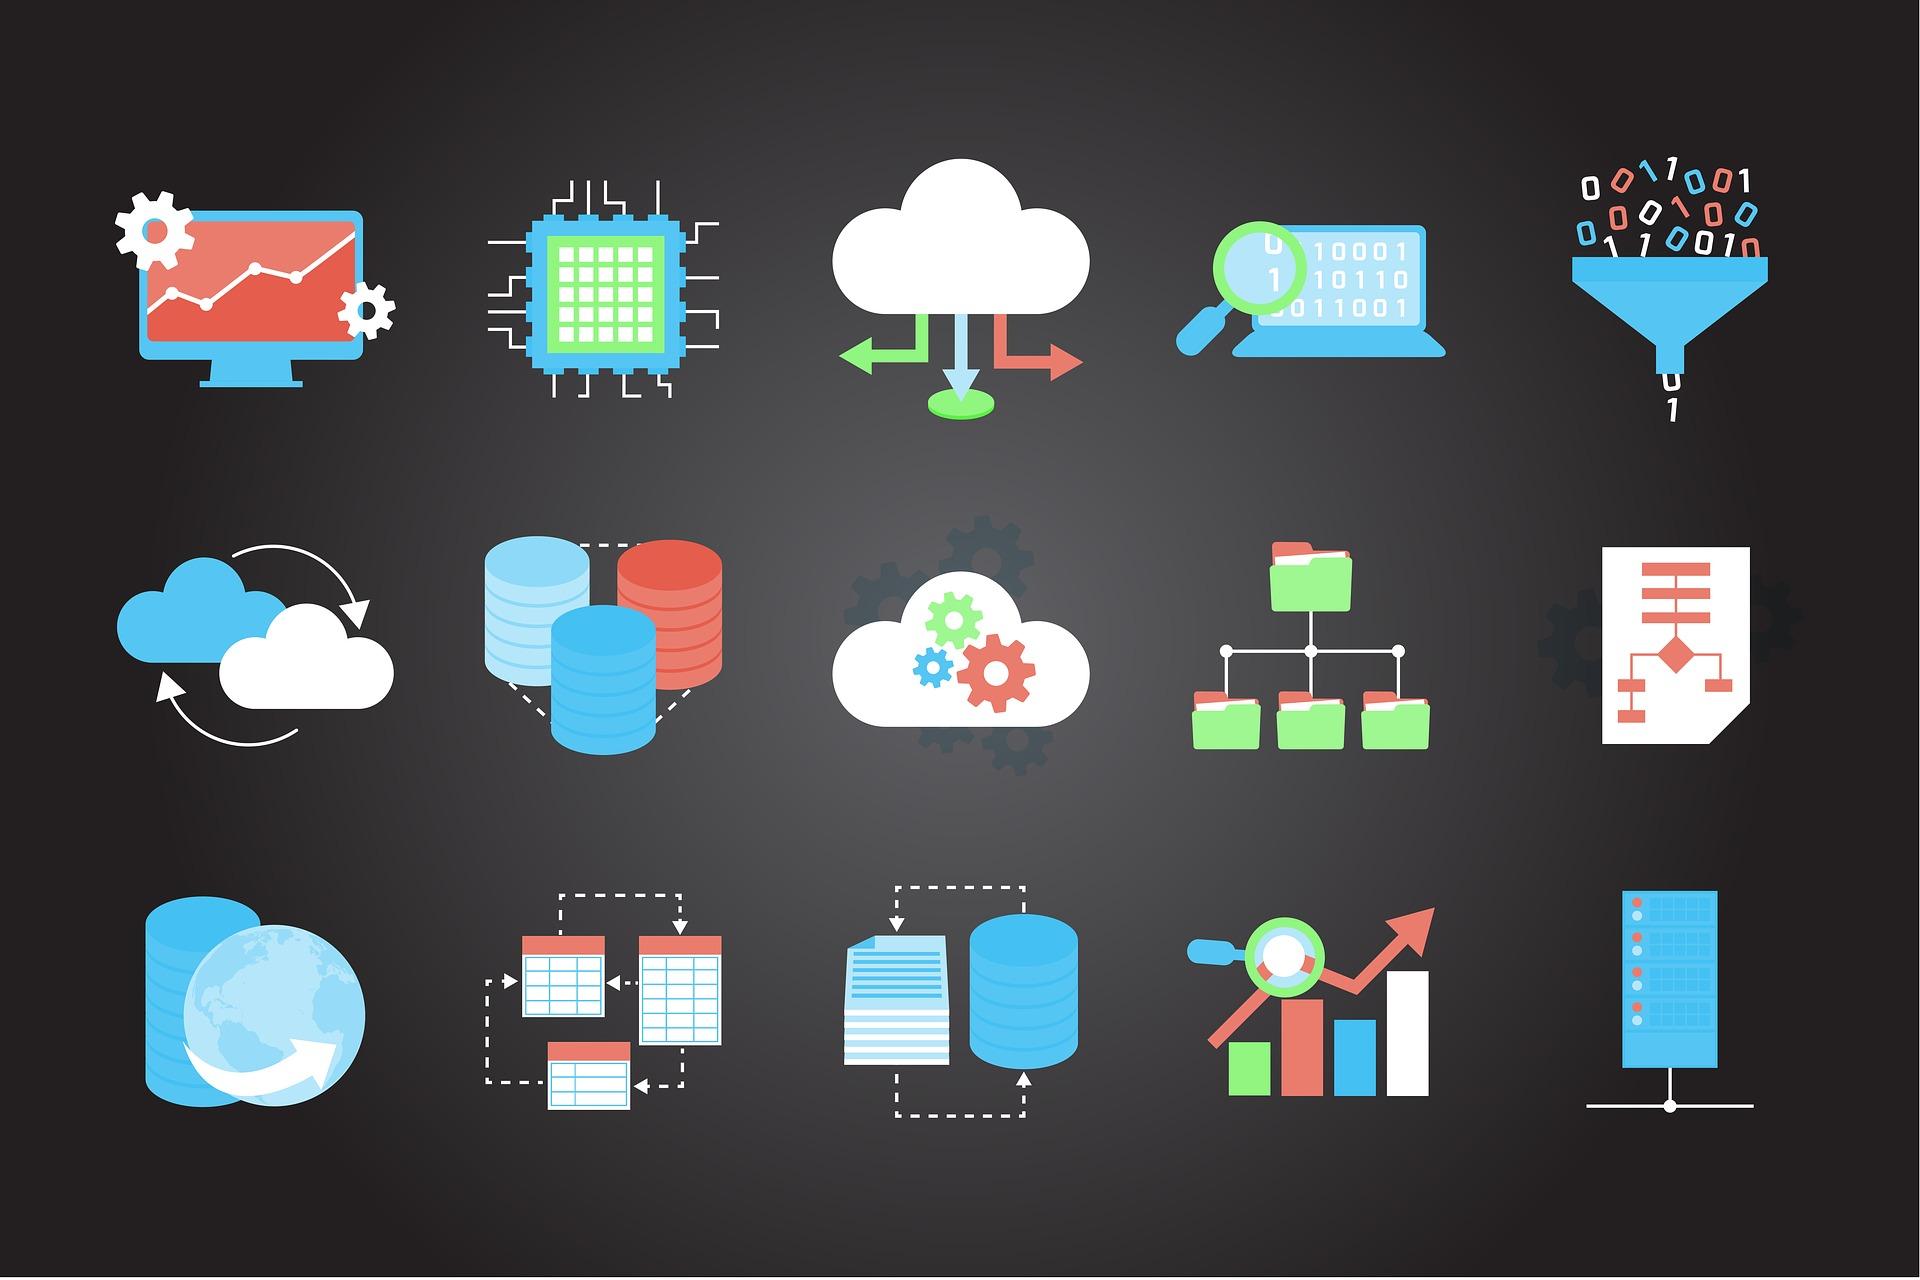 Binaryx Exchange Launches Tokenization Platform for Businesses